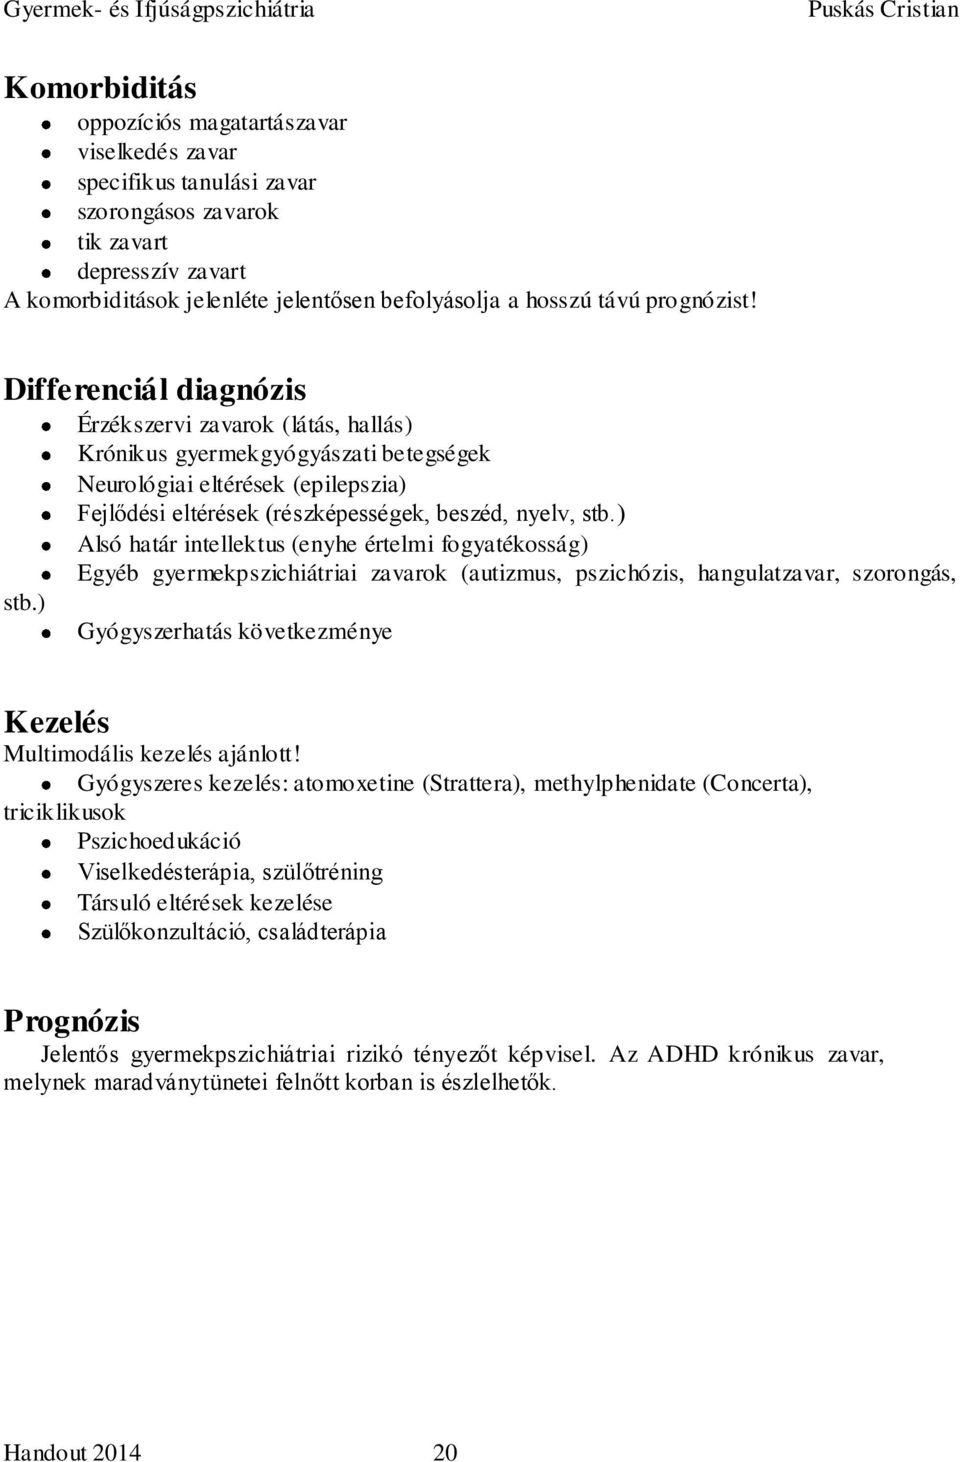 légzési papillomatosis diagnózis)